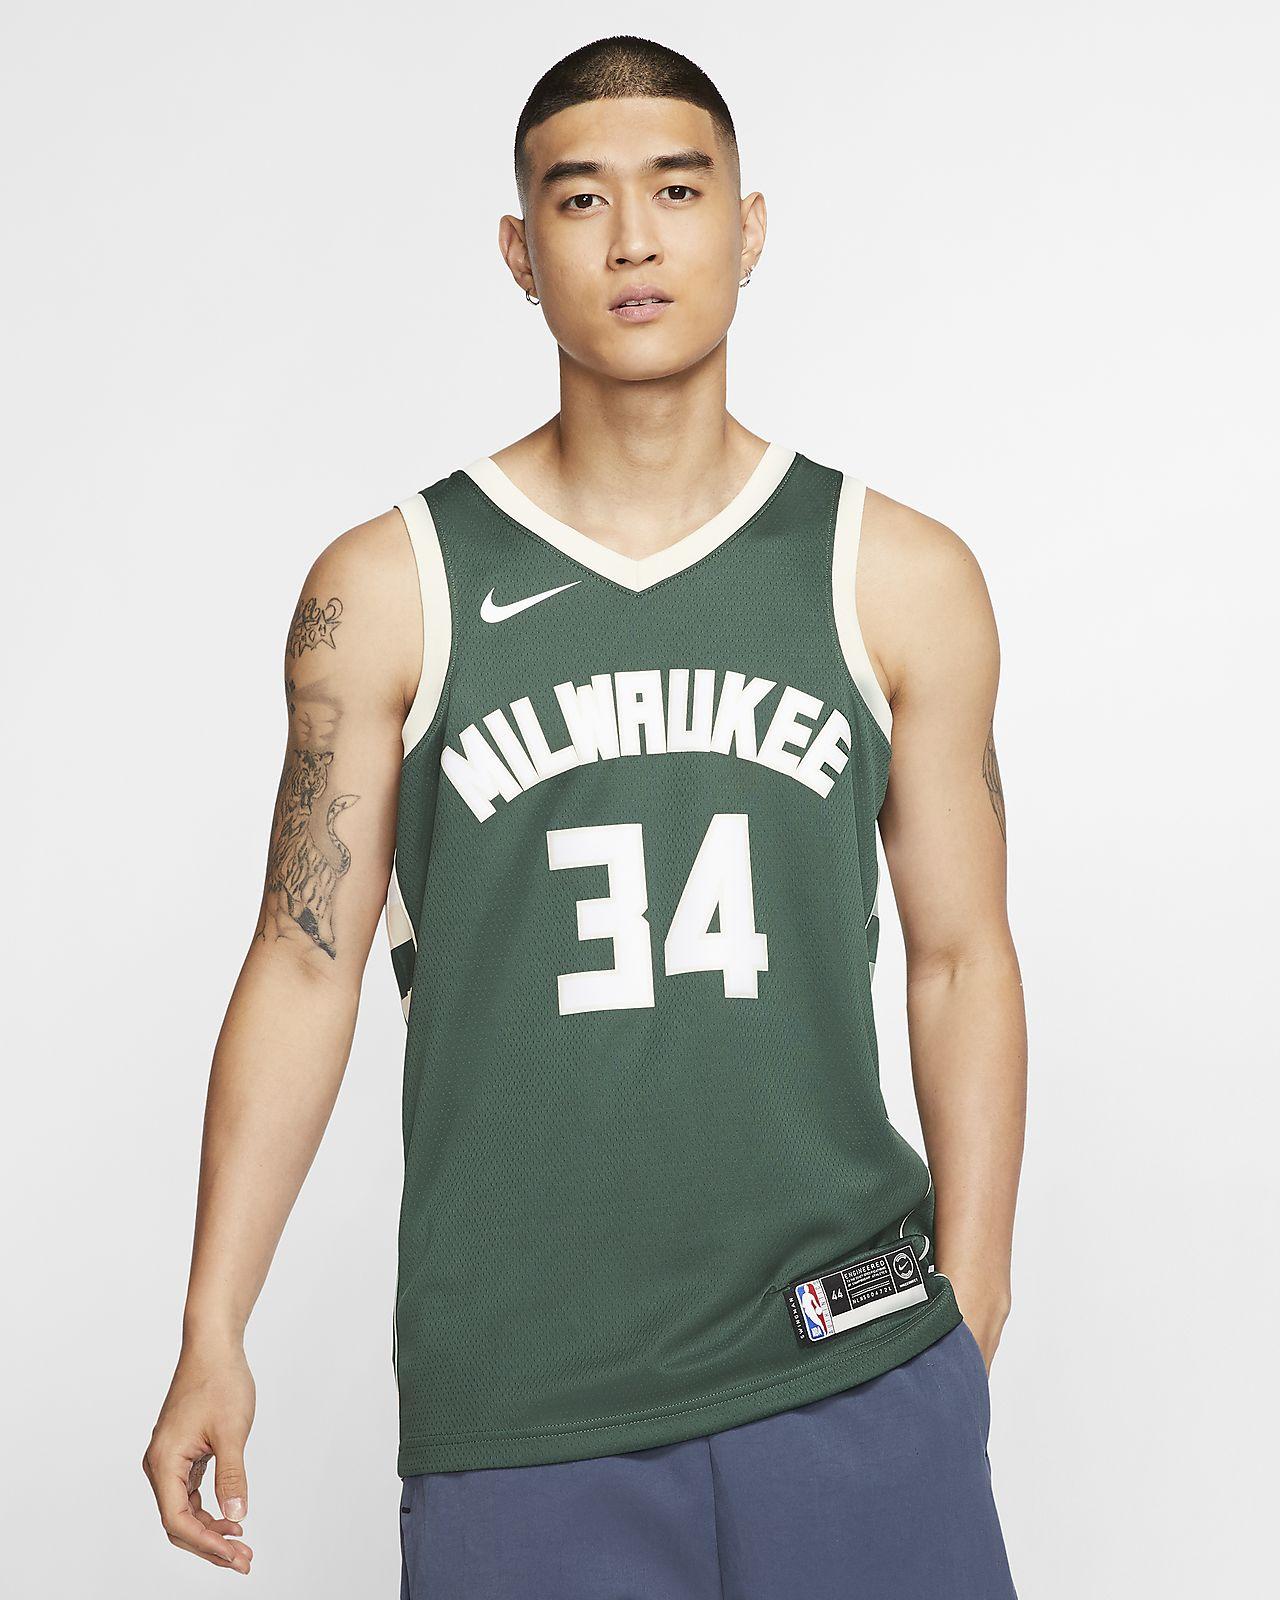 Koszulka męska Nike NBA Swingman Giannis Antetokounmpo Bucks Icon Edition